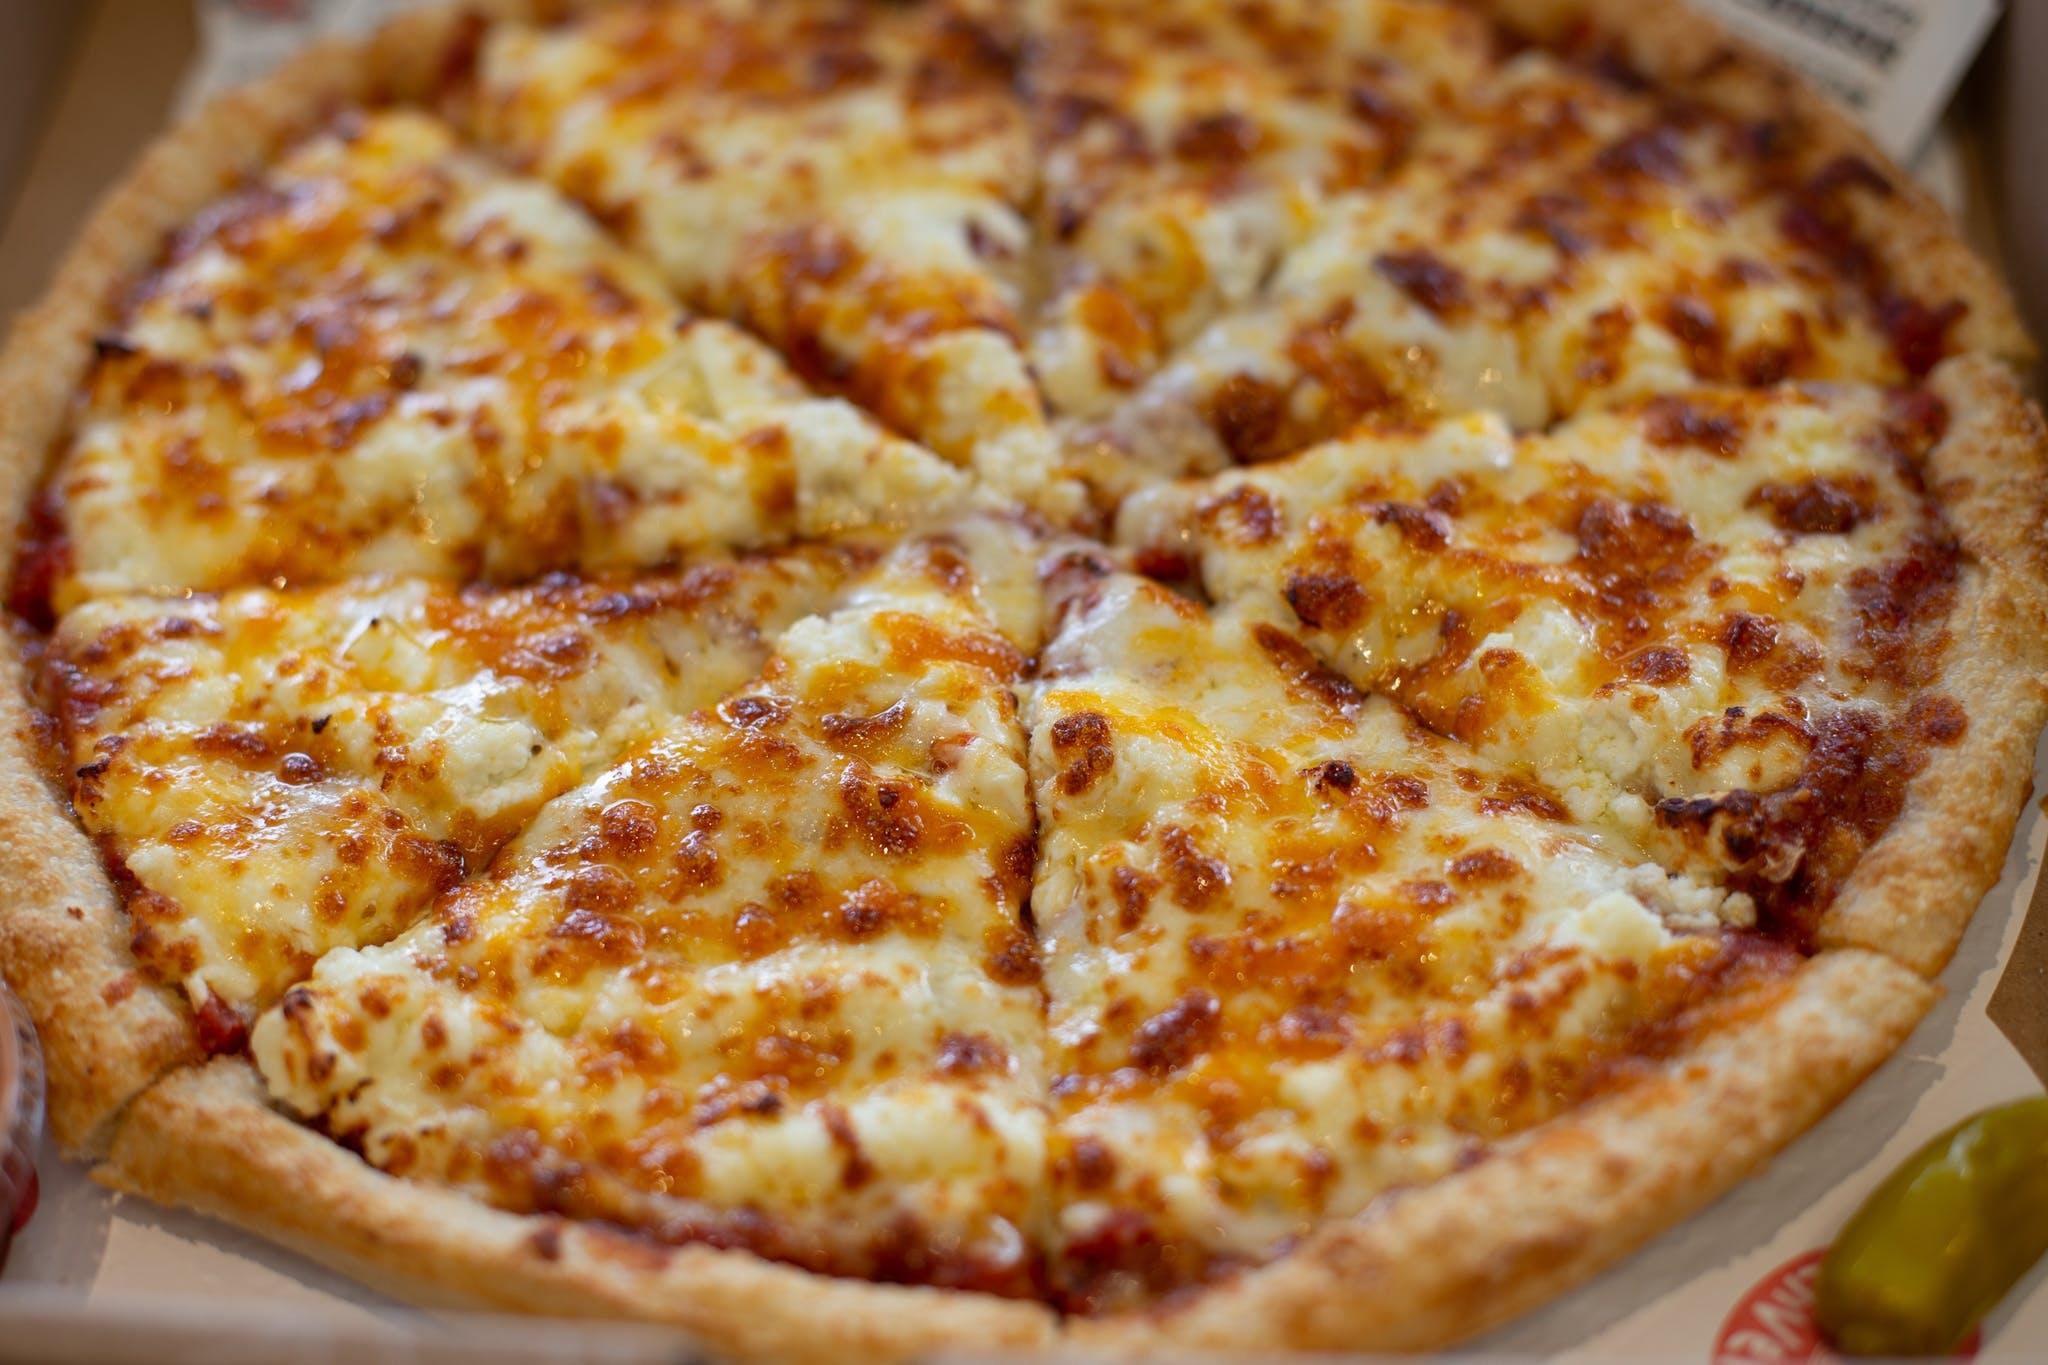 Sarpino's Cheese Bonanza Pizza from Sarpino's Pizzeria - Washington Ave. in Minneapolis, MN